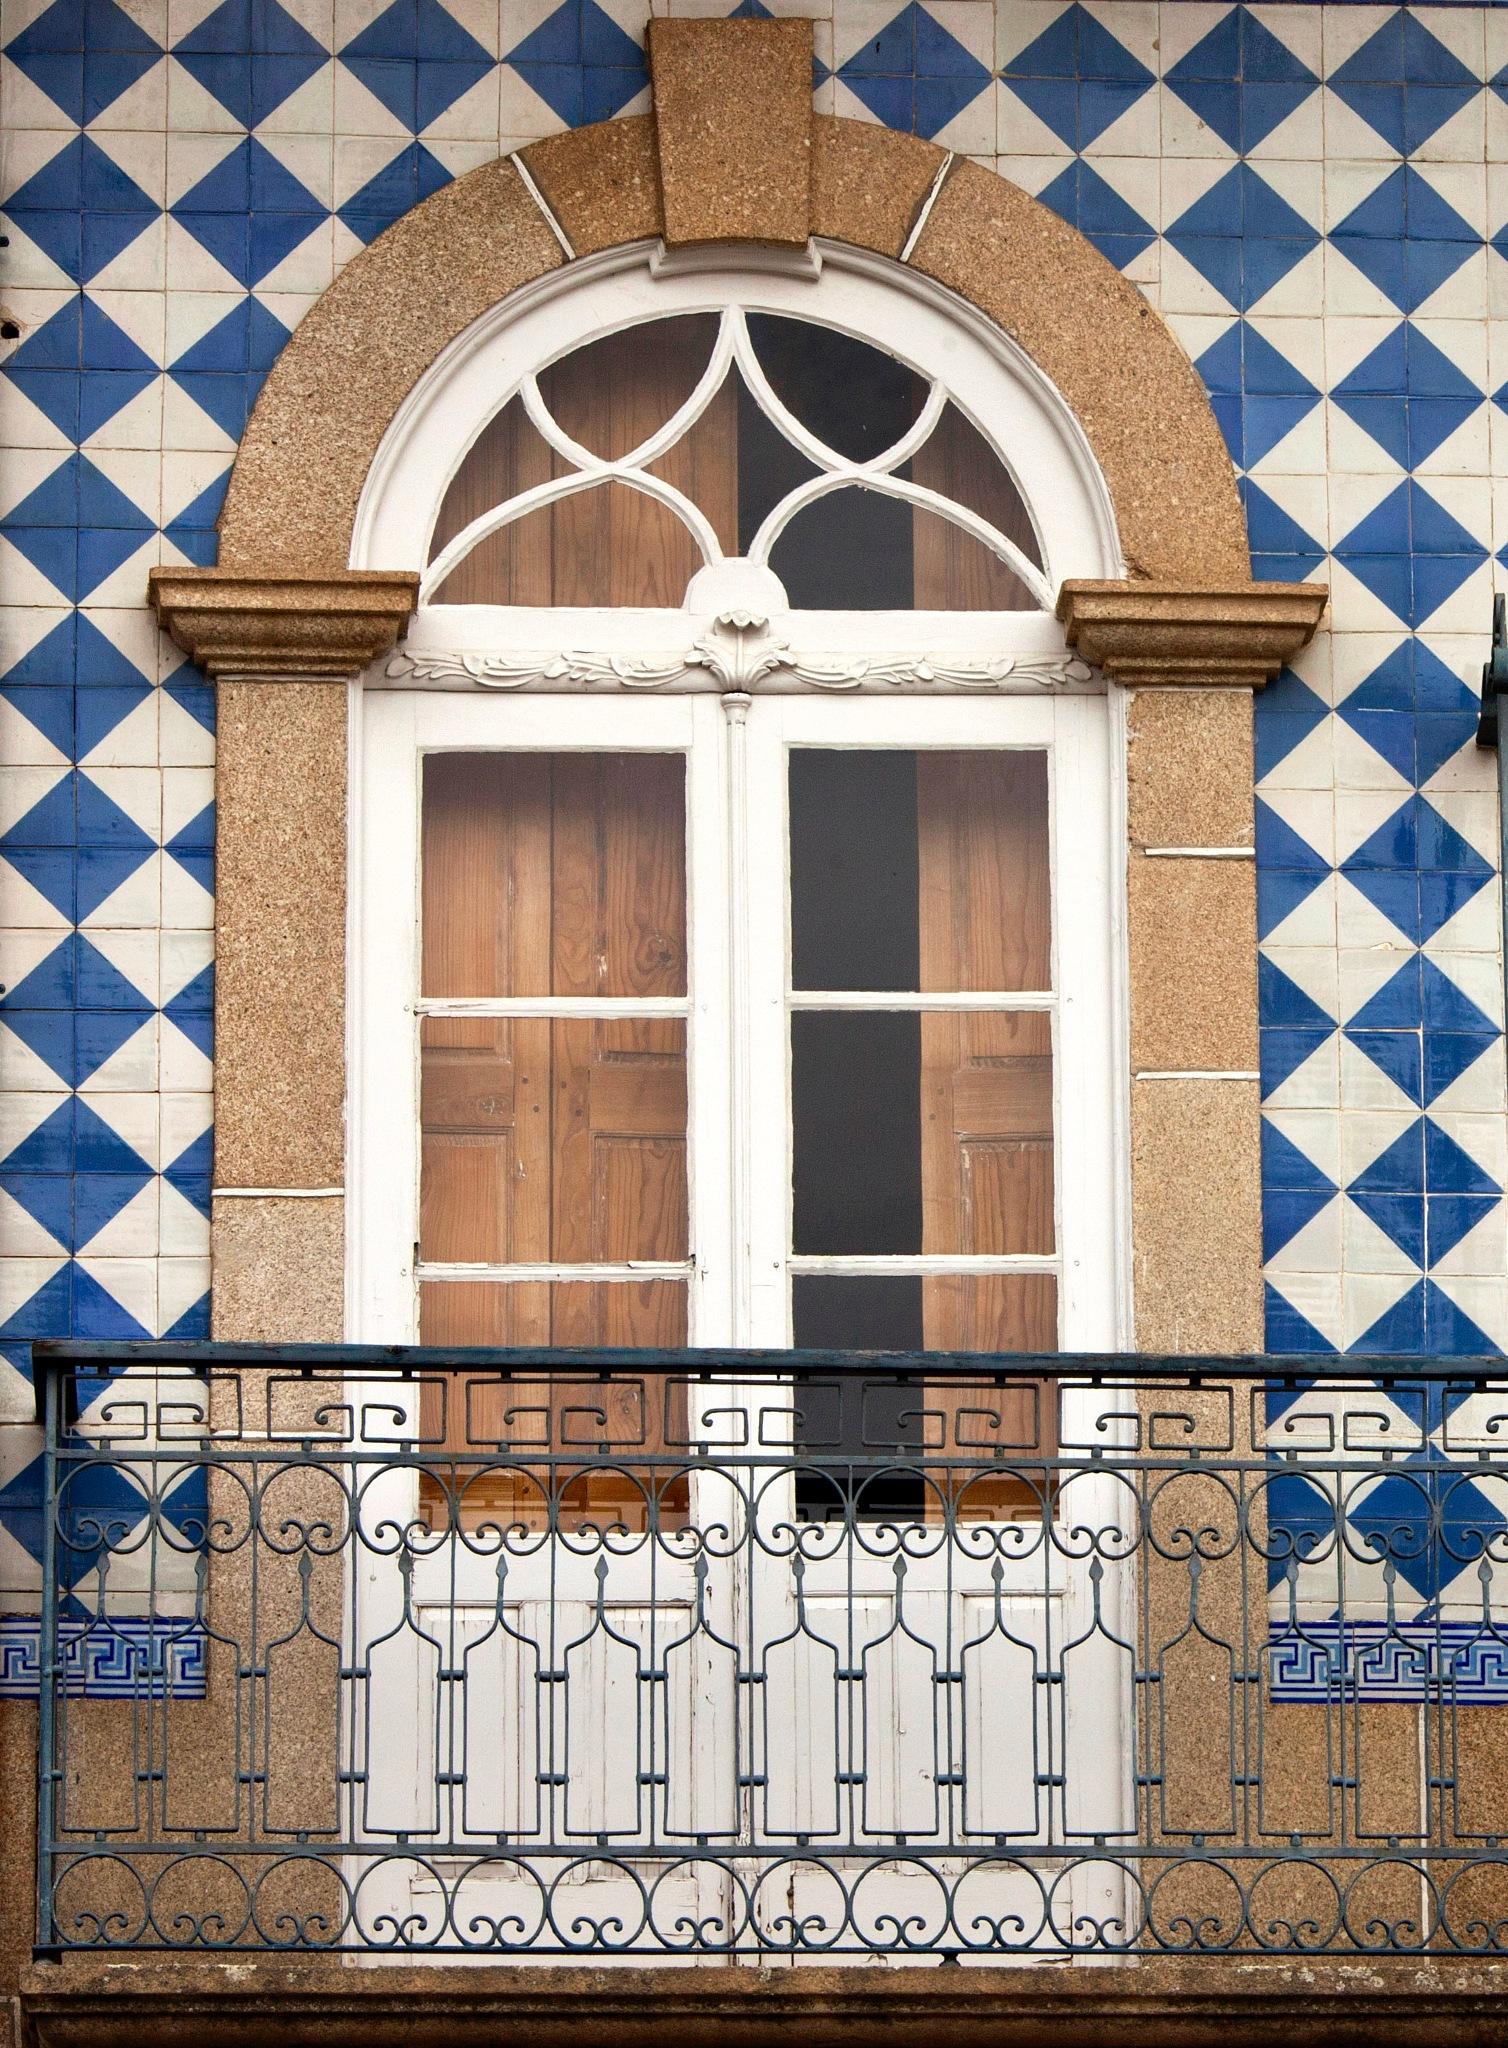 Window by Francisco Sá da Bandeira